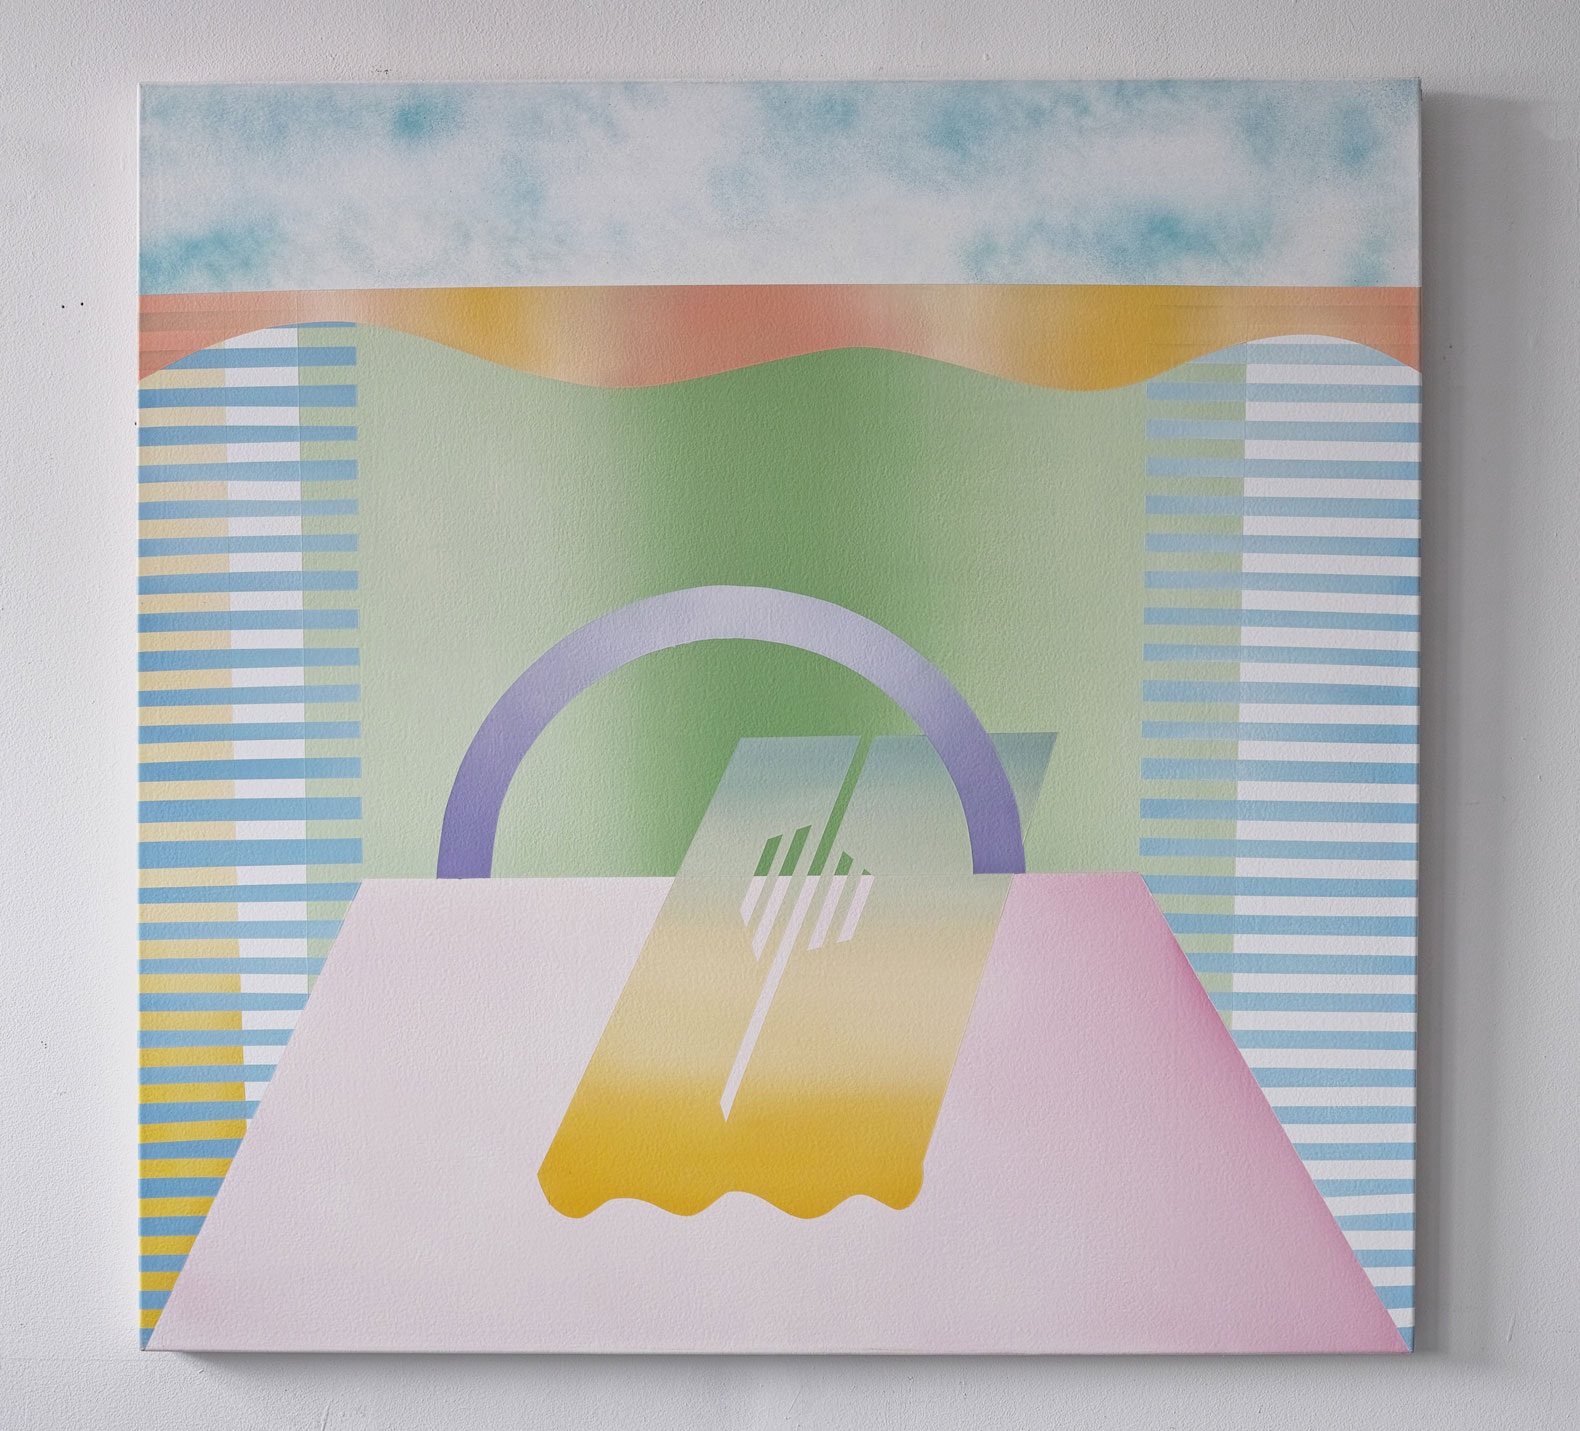 gregory c. brunet // sunshine lollipop // oil on canvas // 121.92 x 121.92cm // 2015